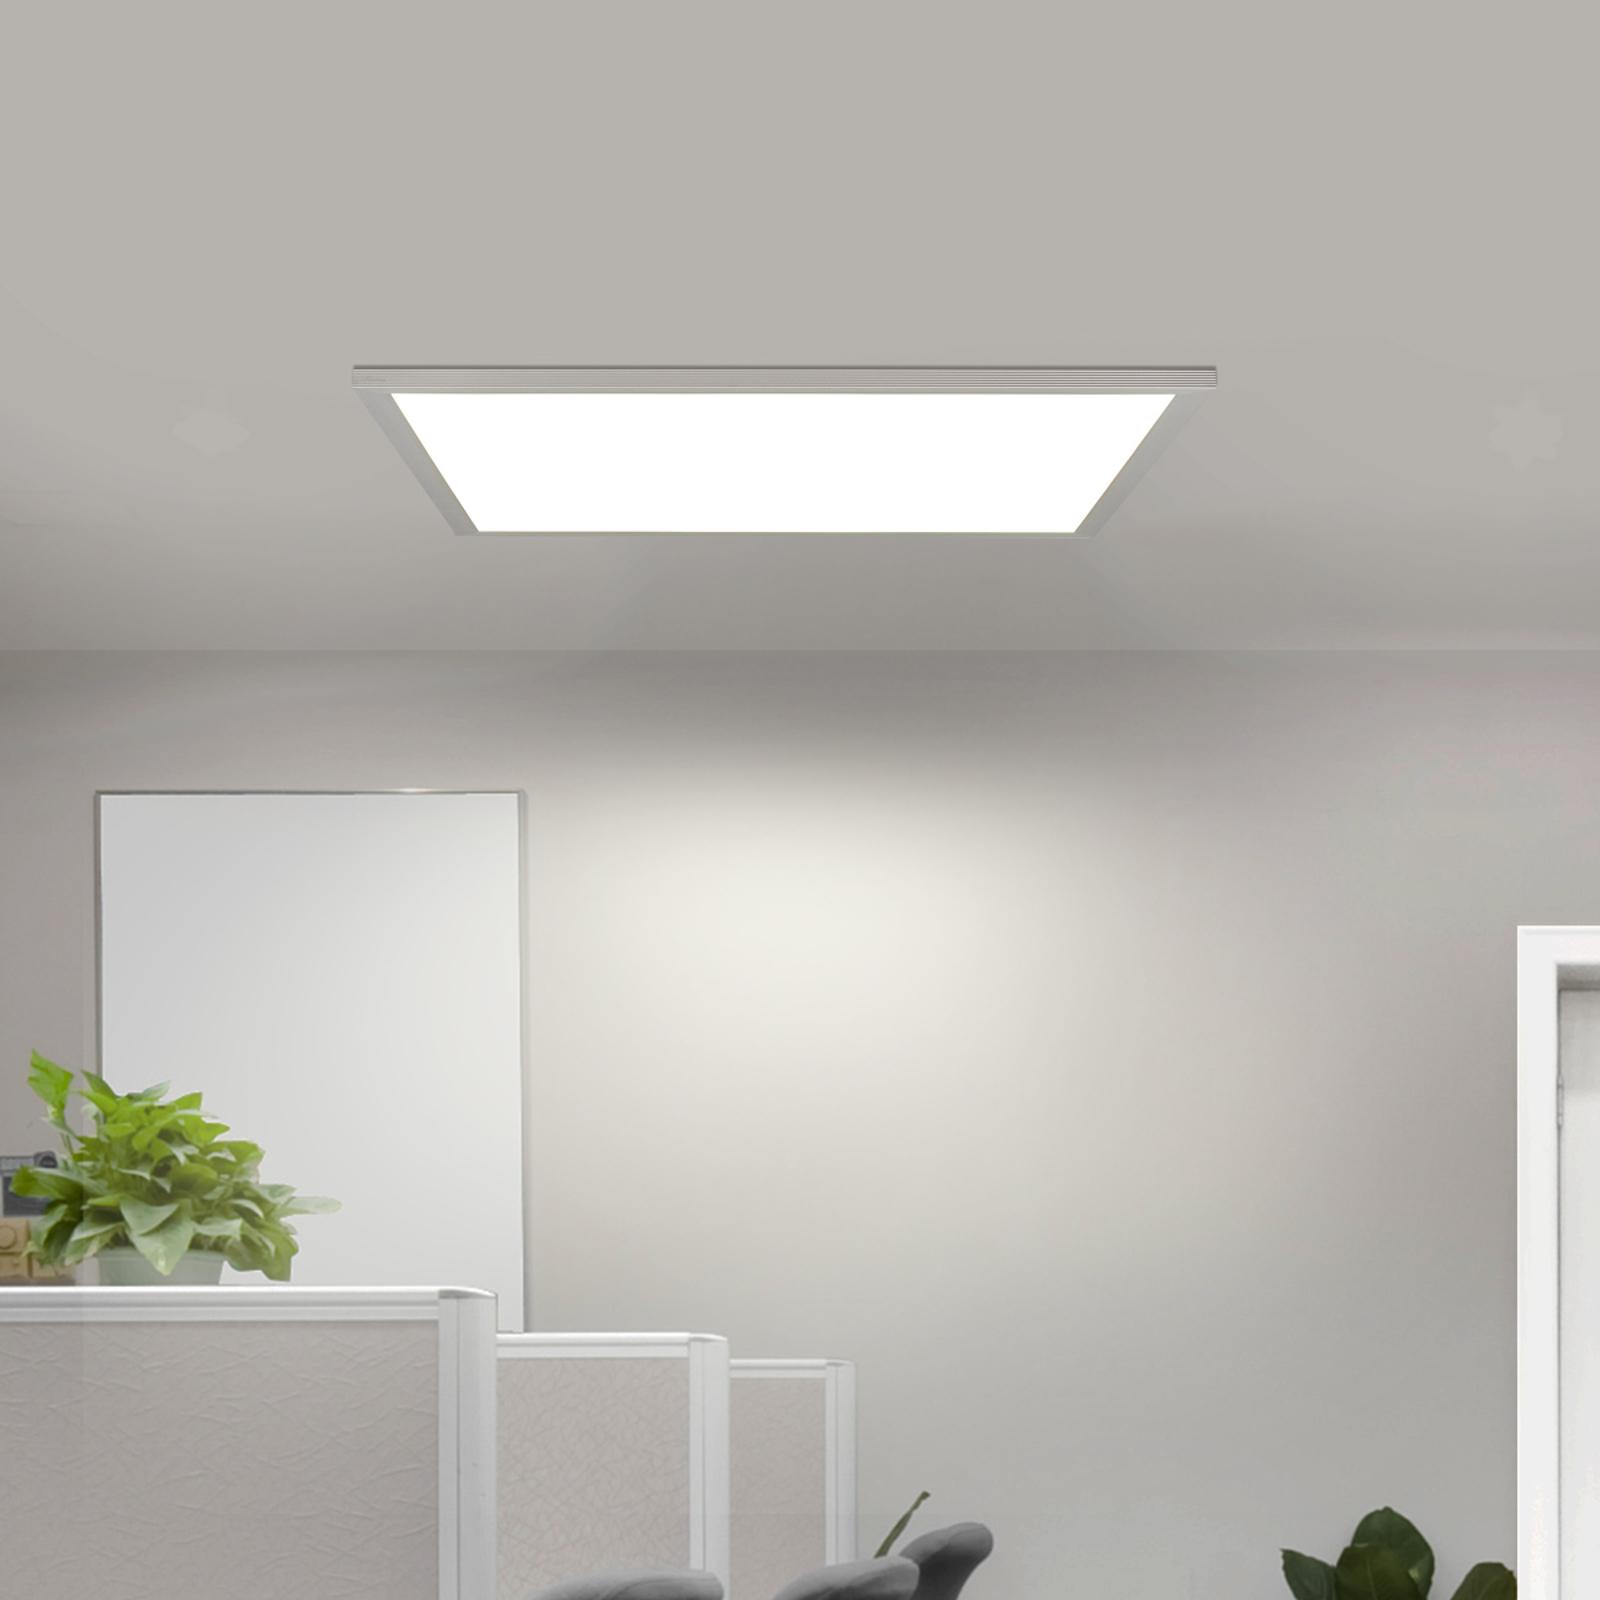 Panel LED All-in-One Edge, luz diurna